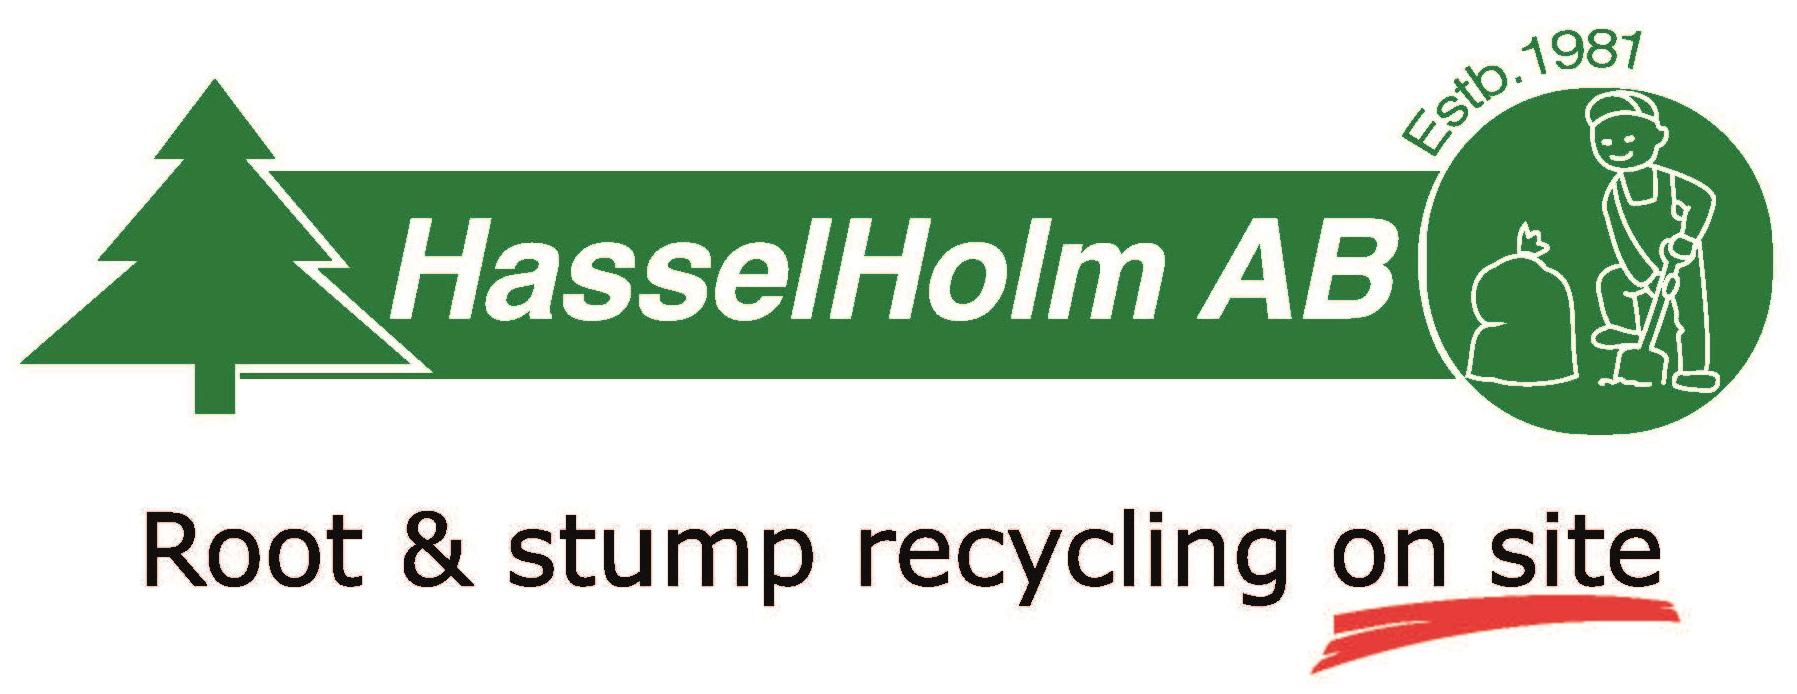 HasselHolm AB